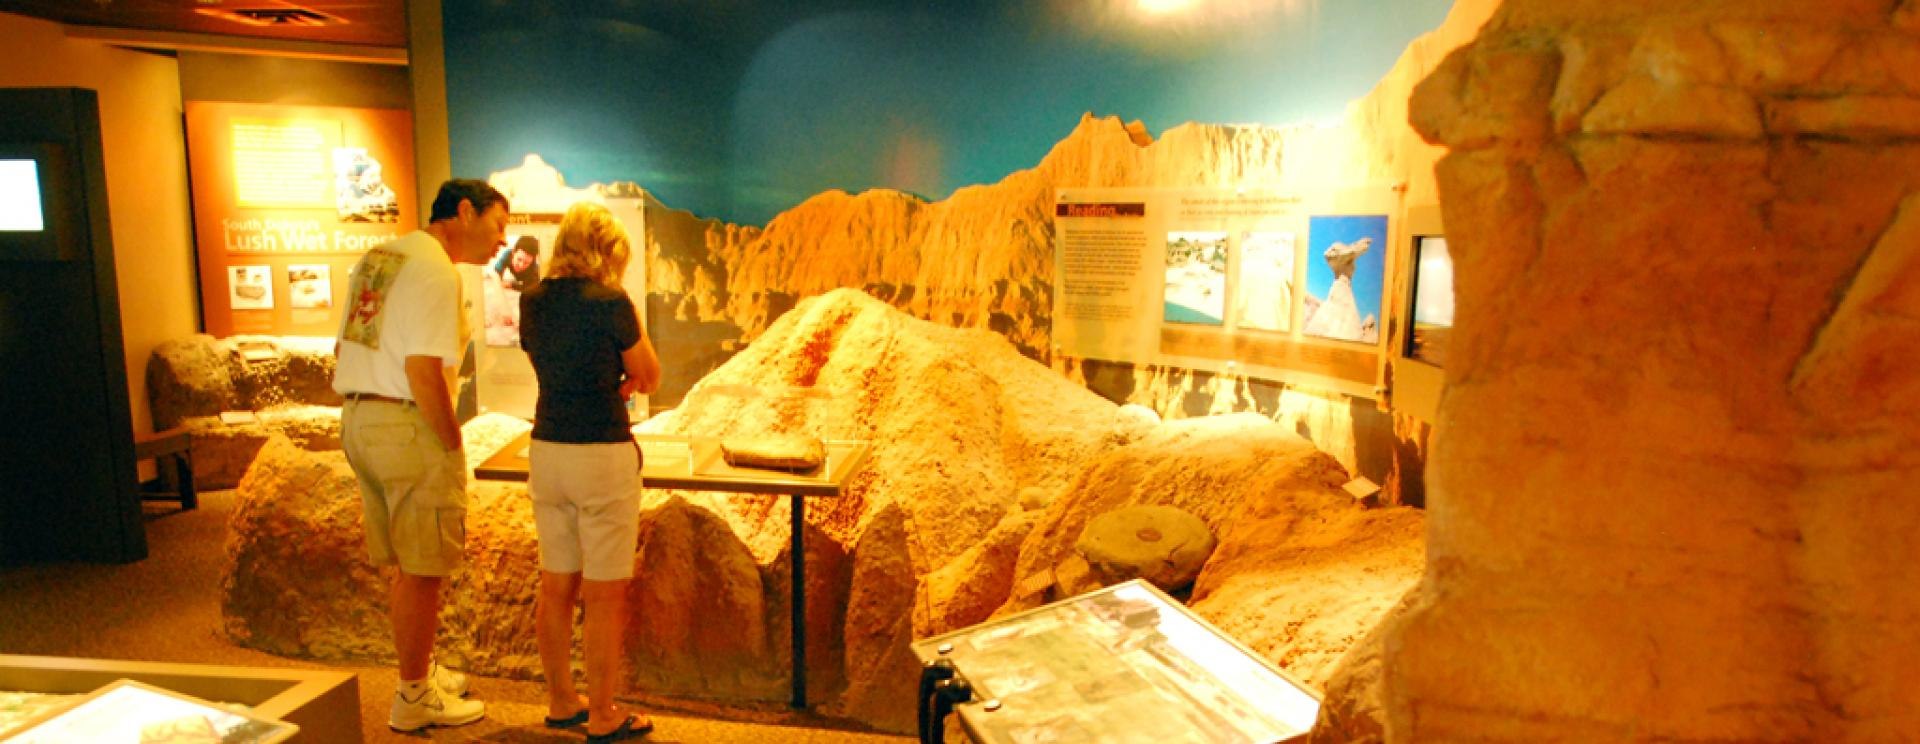 Ben Reifel Visitor Center